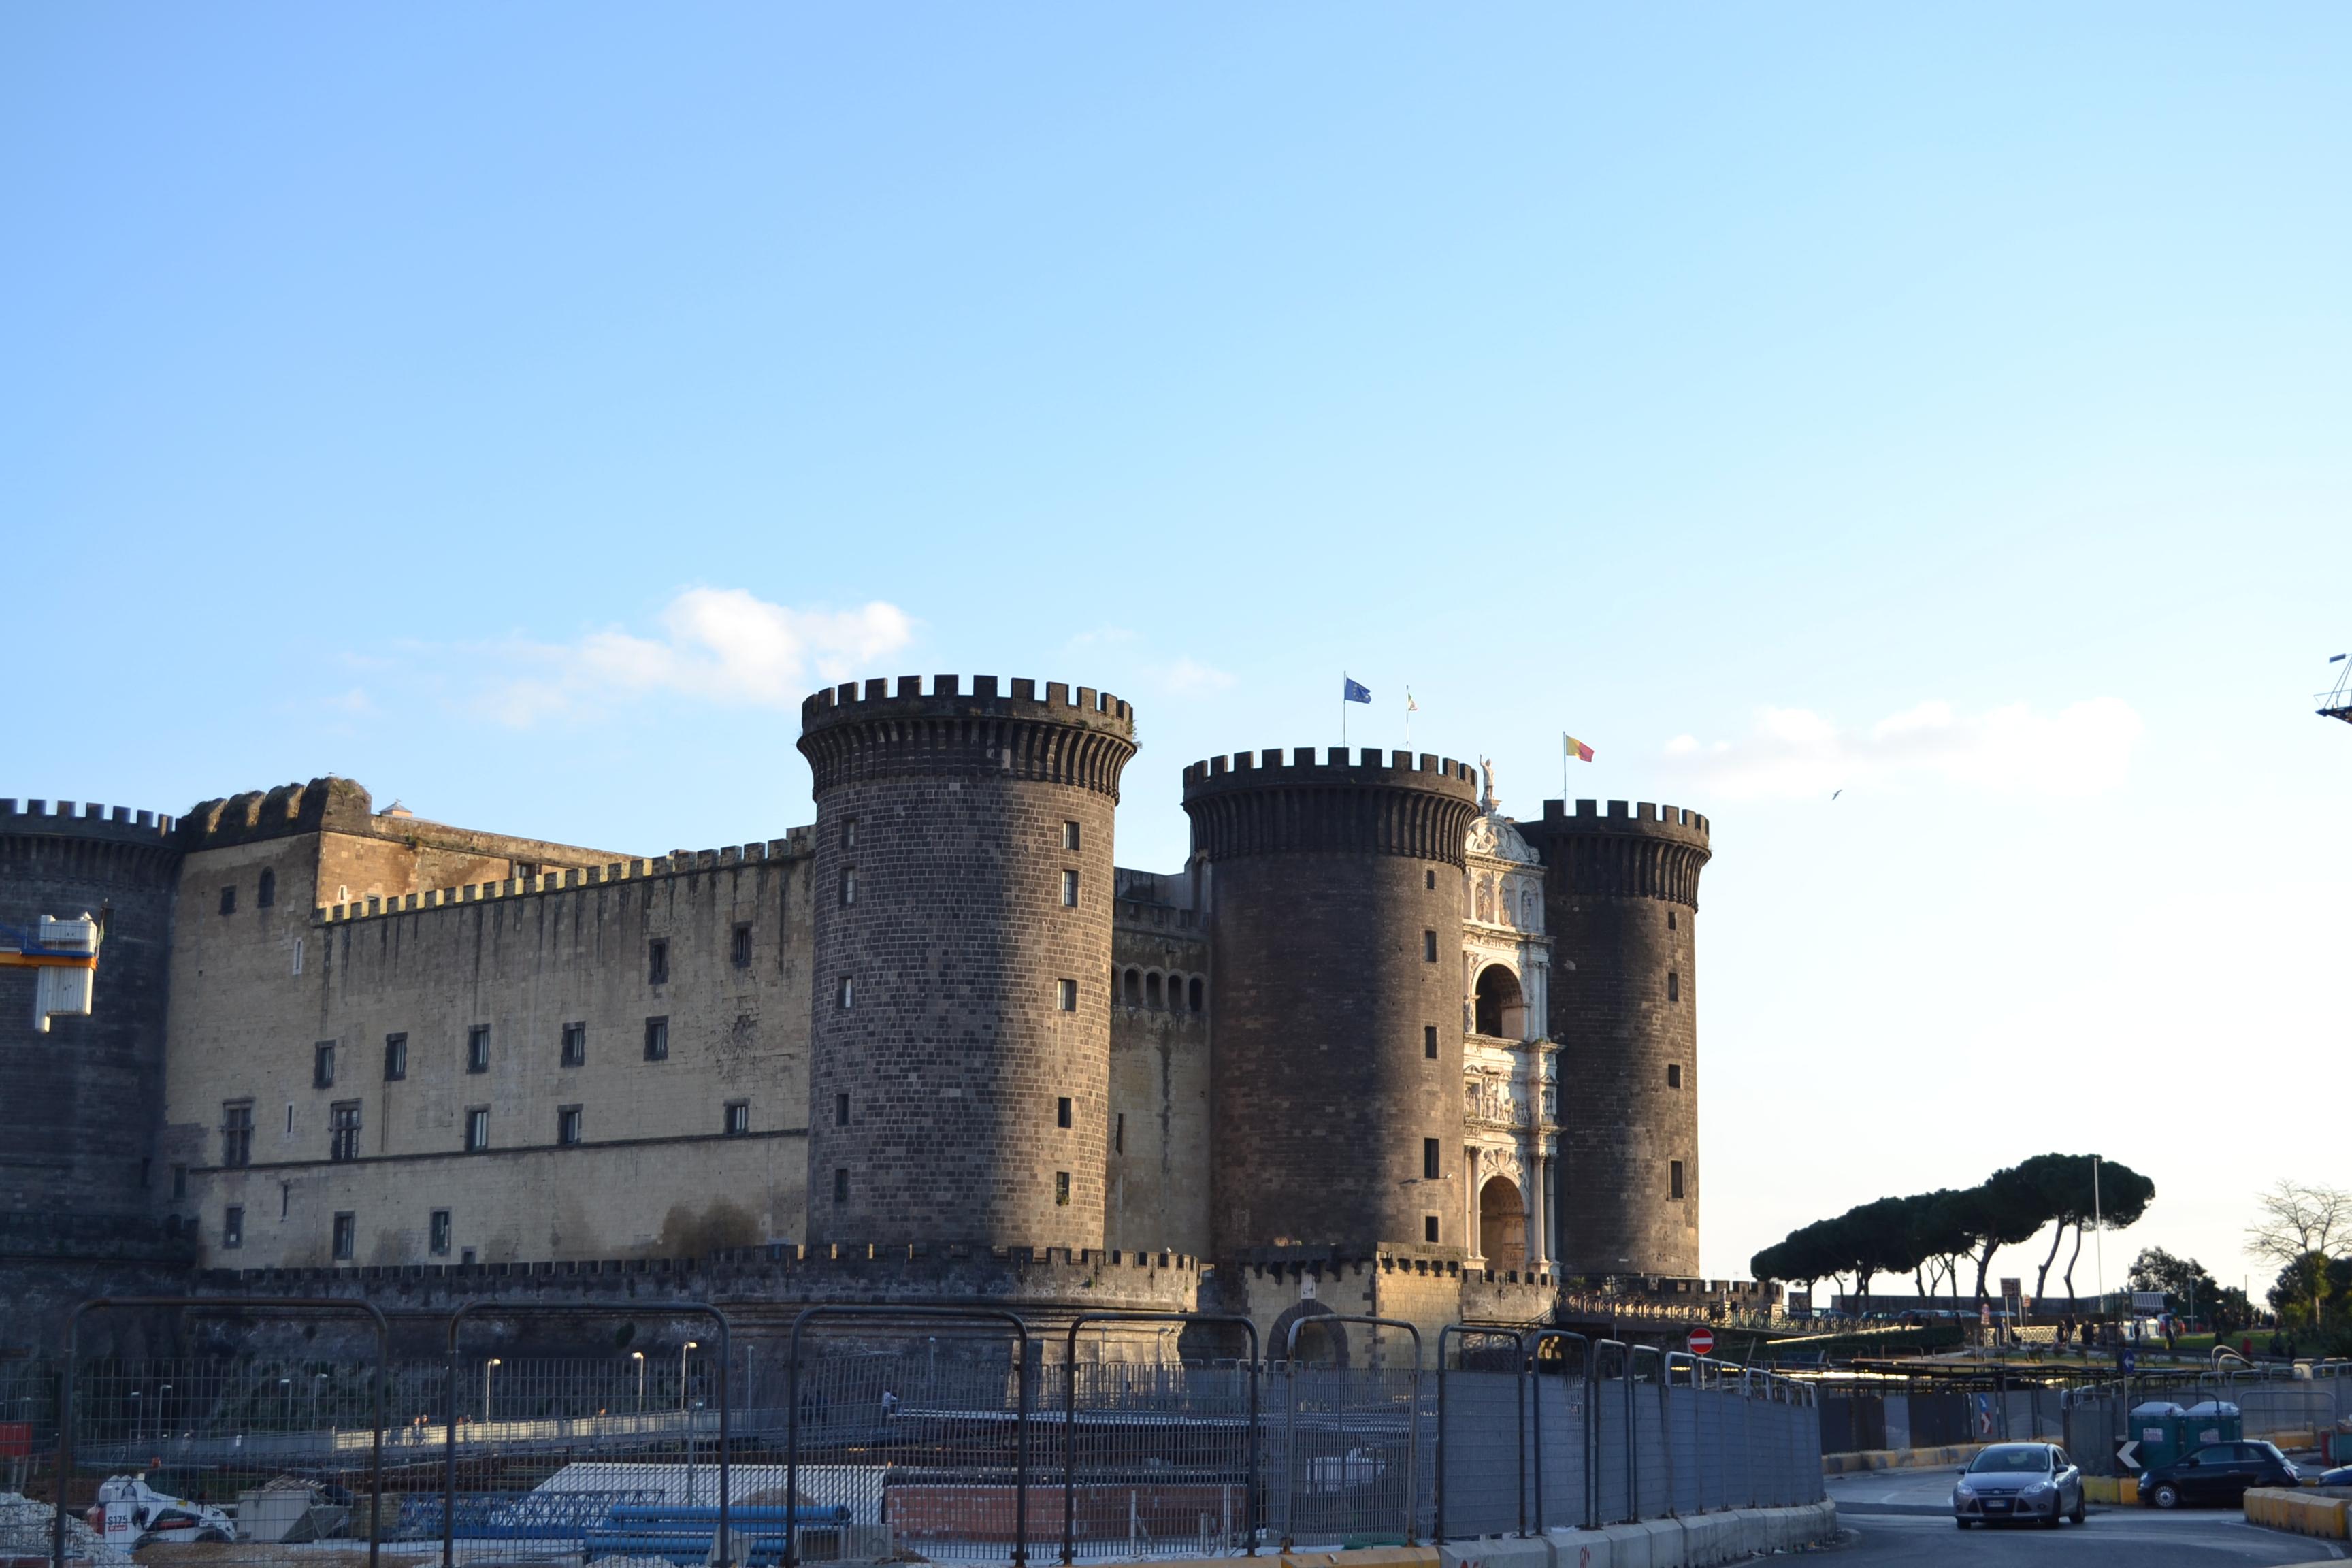 ITALIE - Naples - Castel Nuovo